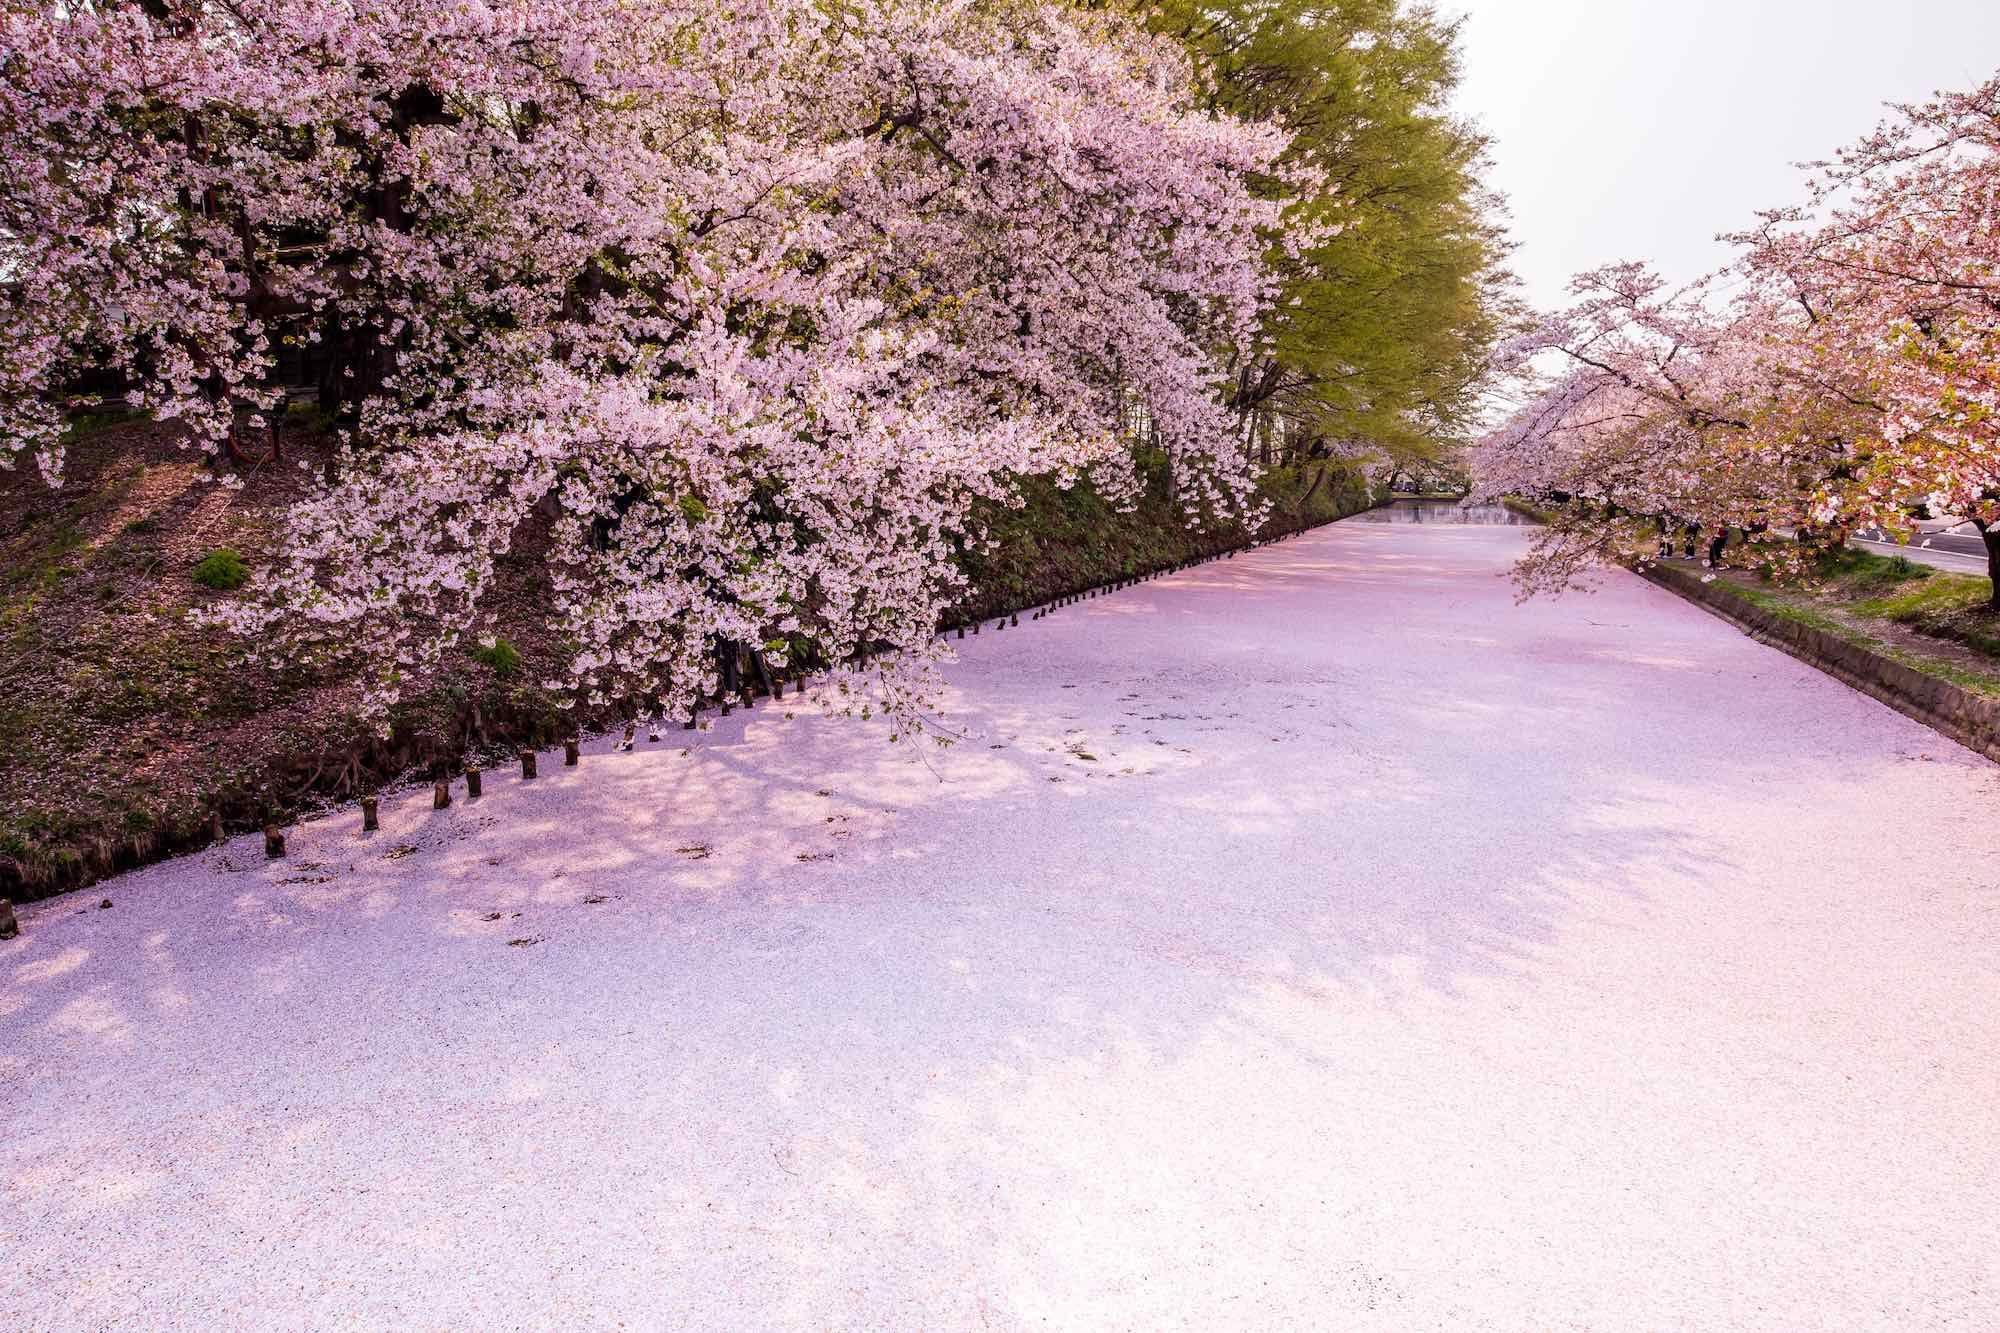 Five Ways To View Cherry Blossoms At Northern Japan S Favorite Sakura Viewing Park Hirosaki Cherry Blossom Beautiful Photography